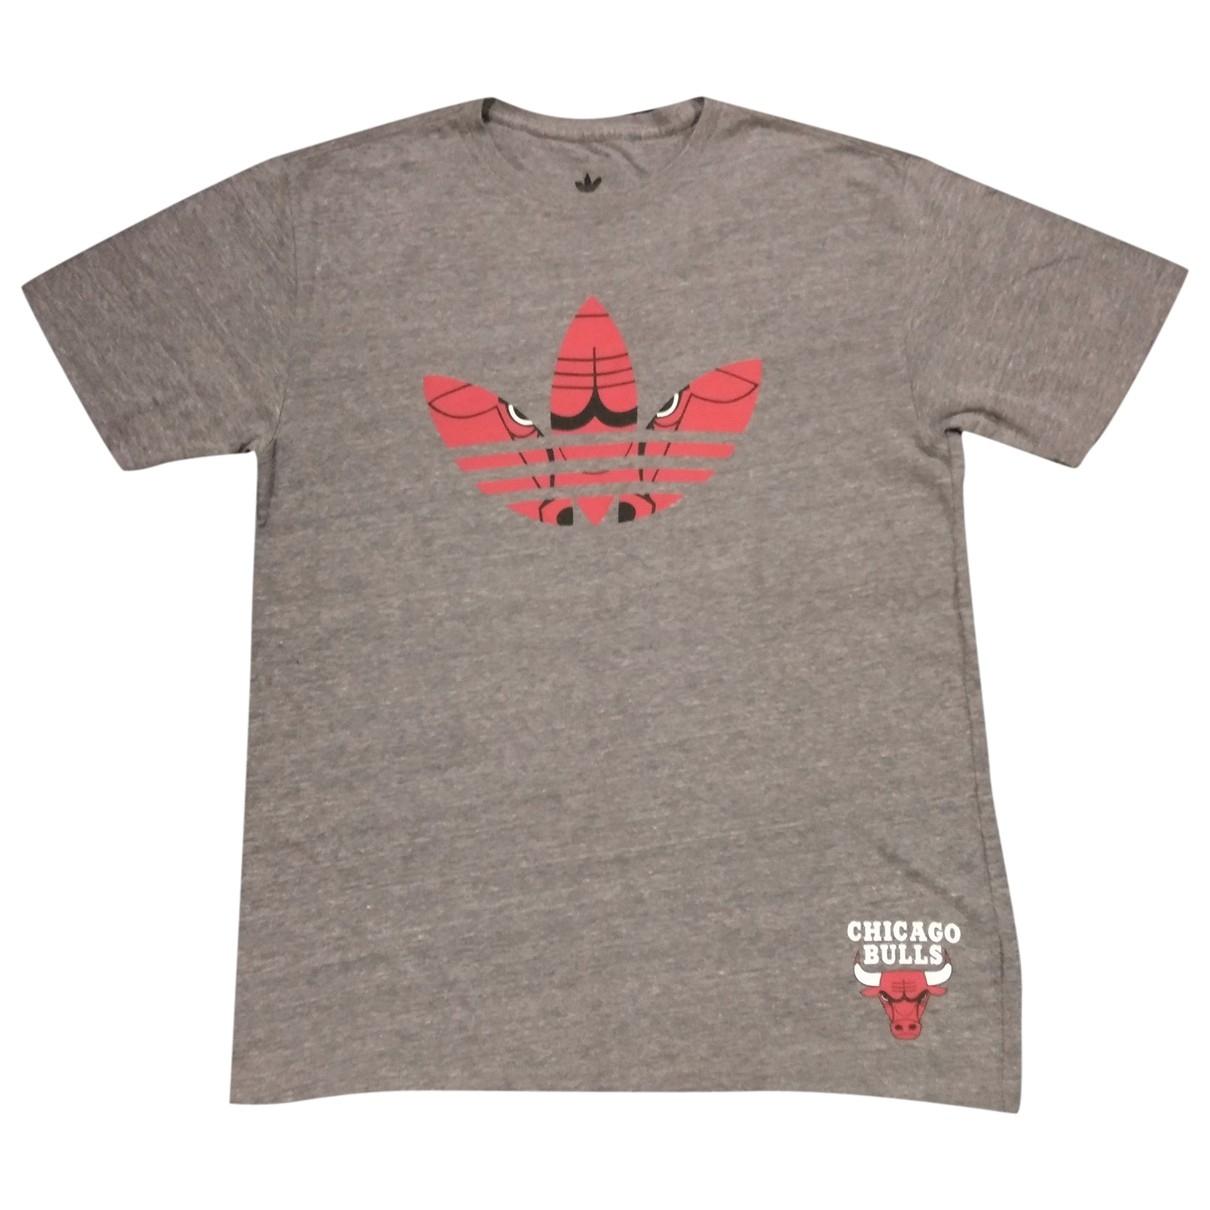 Adidas \N Grey Cotton T-shirts for Men M